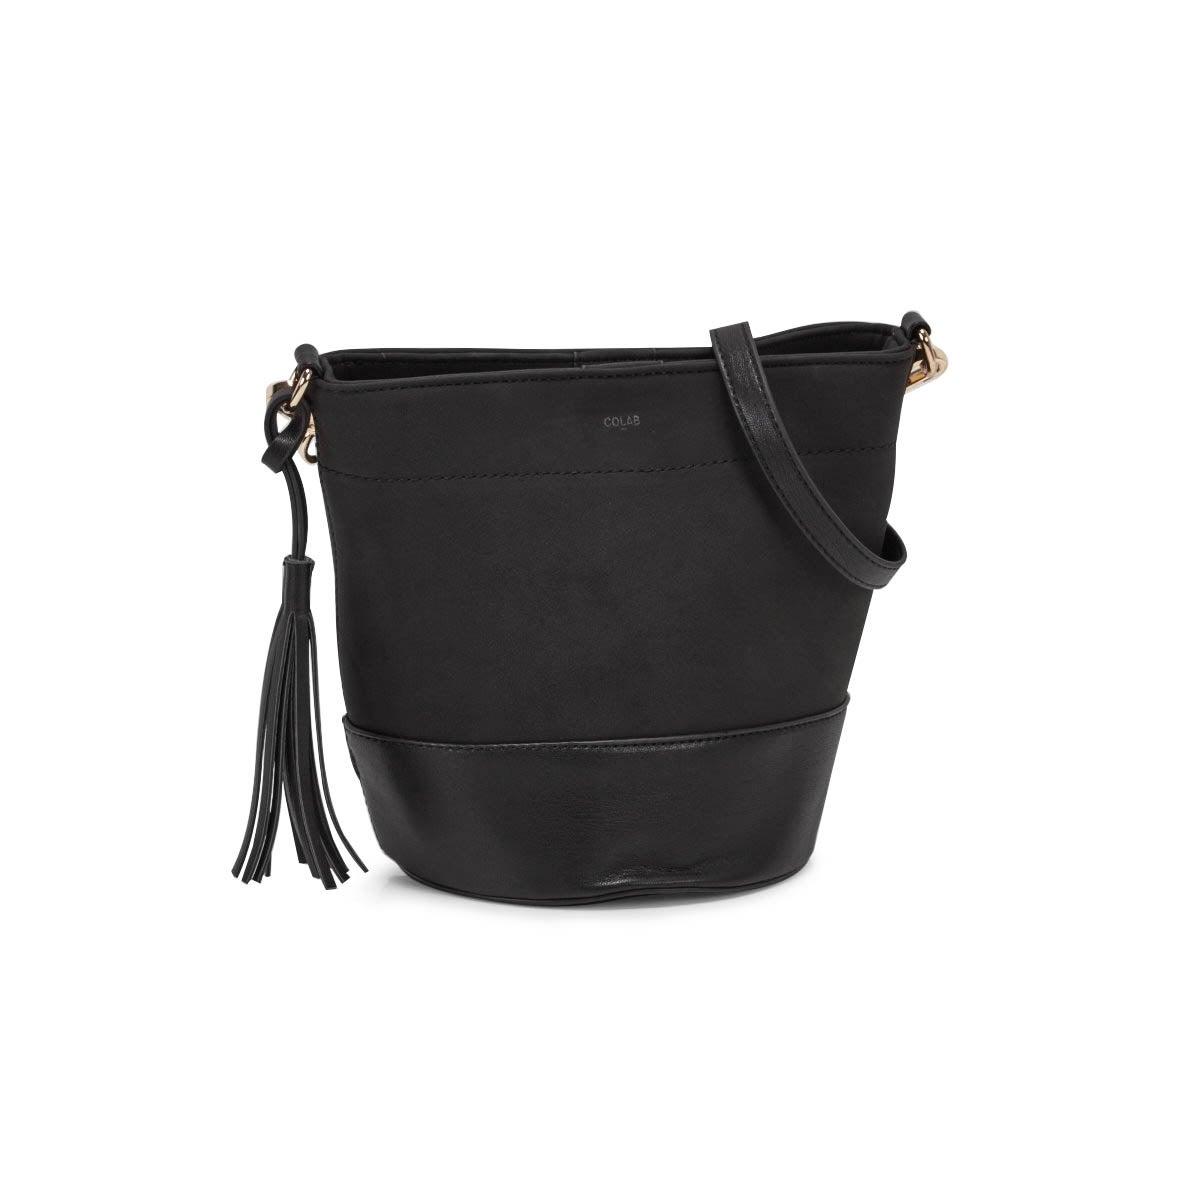 Lds black small bucket crossbody bag